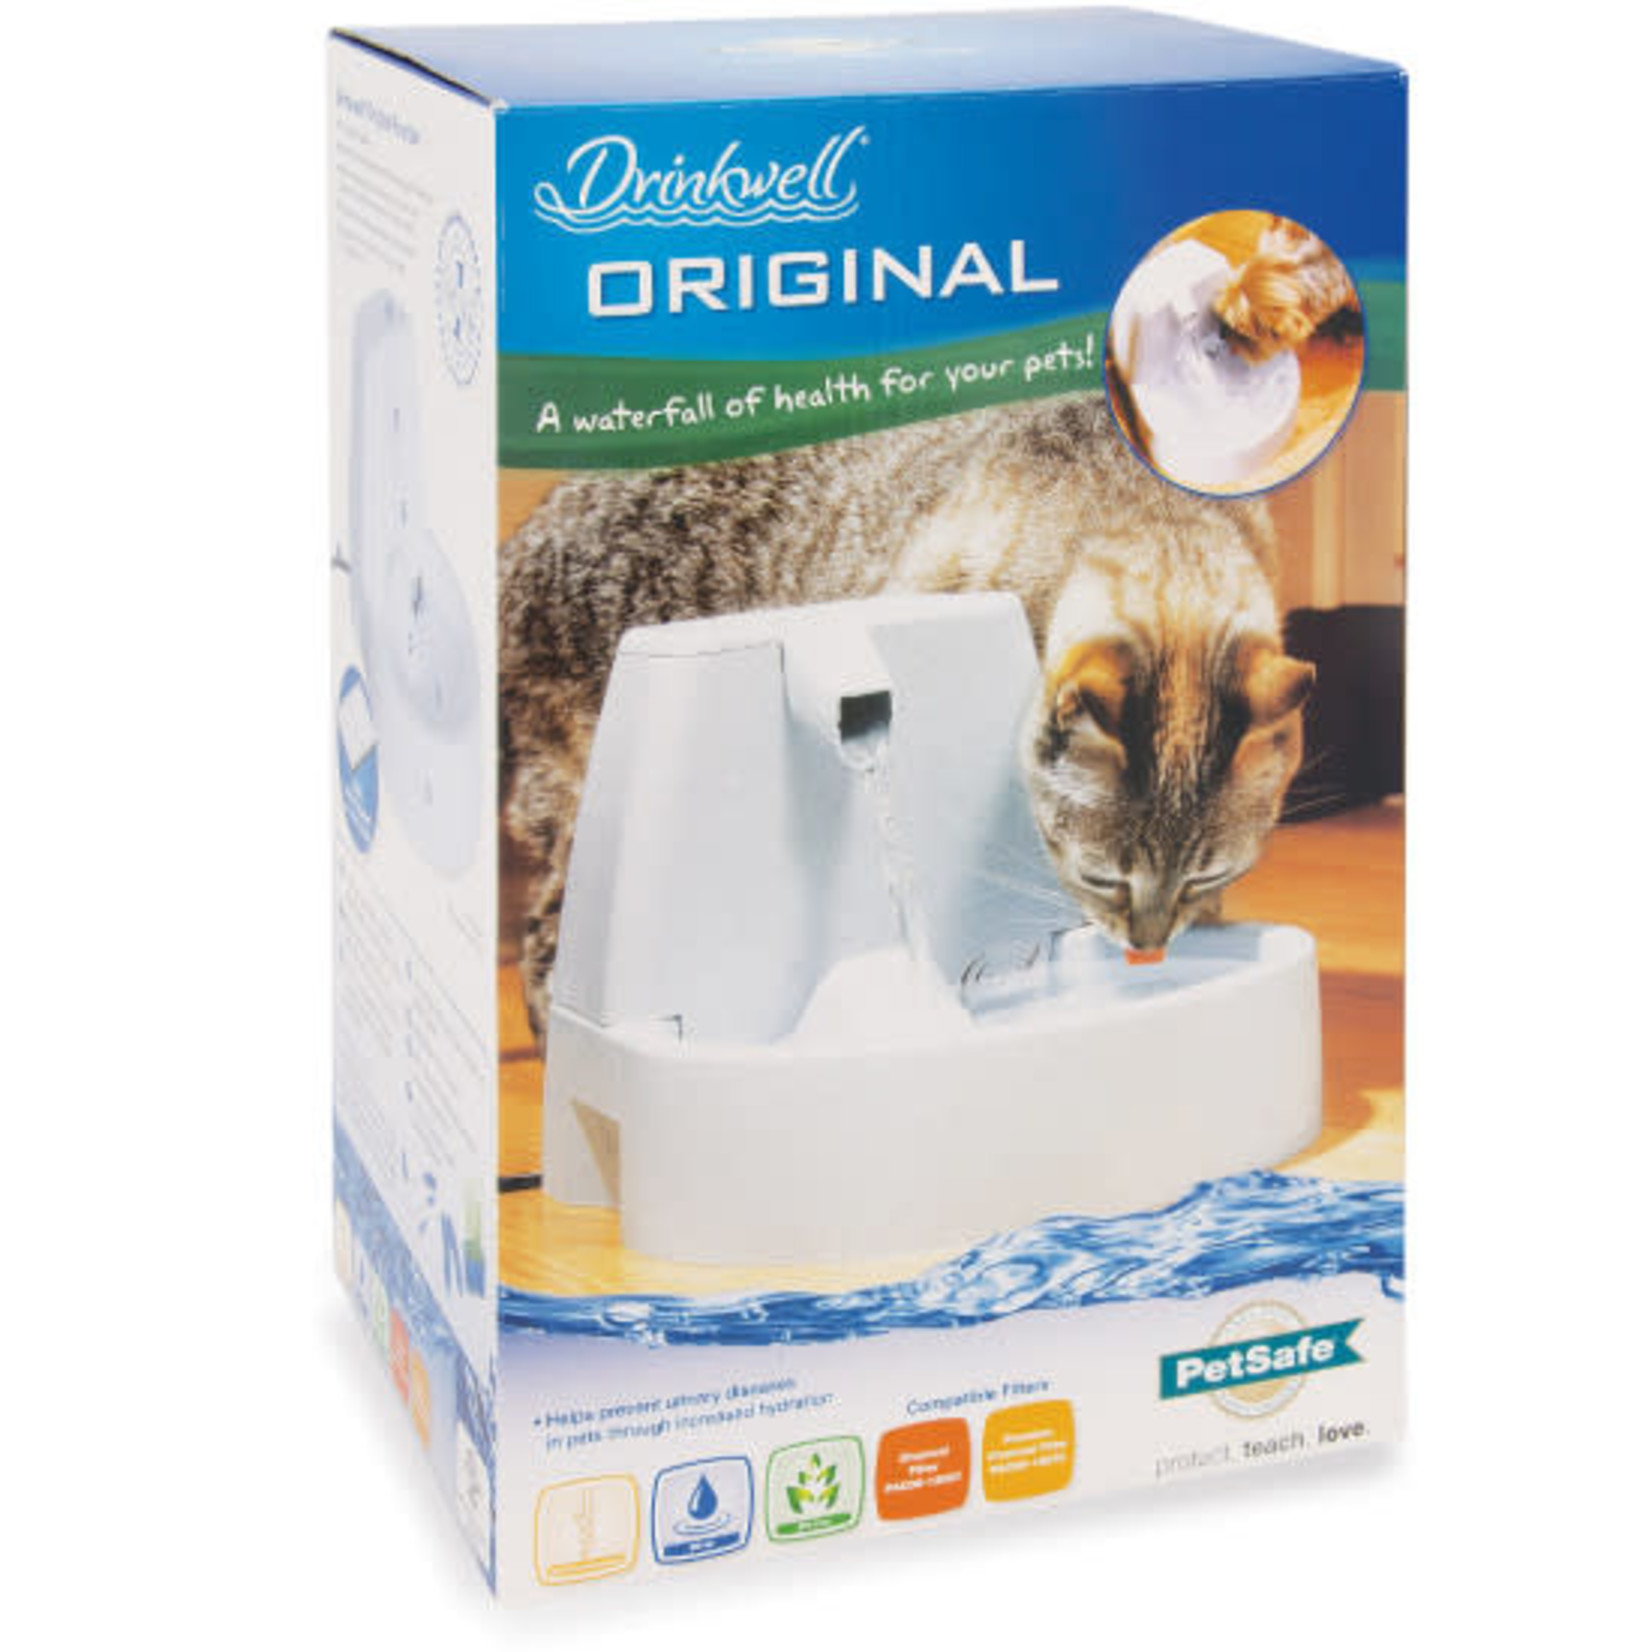 Pet Safe / Radio Systems Corp. Drinkwell Original Fountain 50 OZ